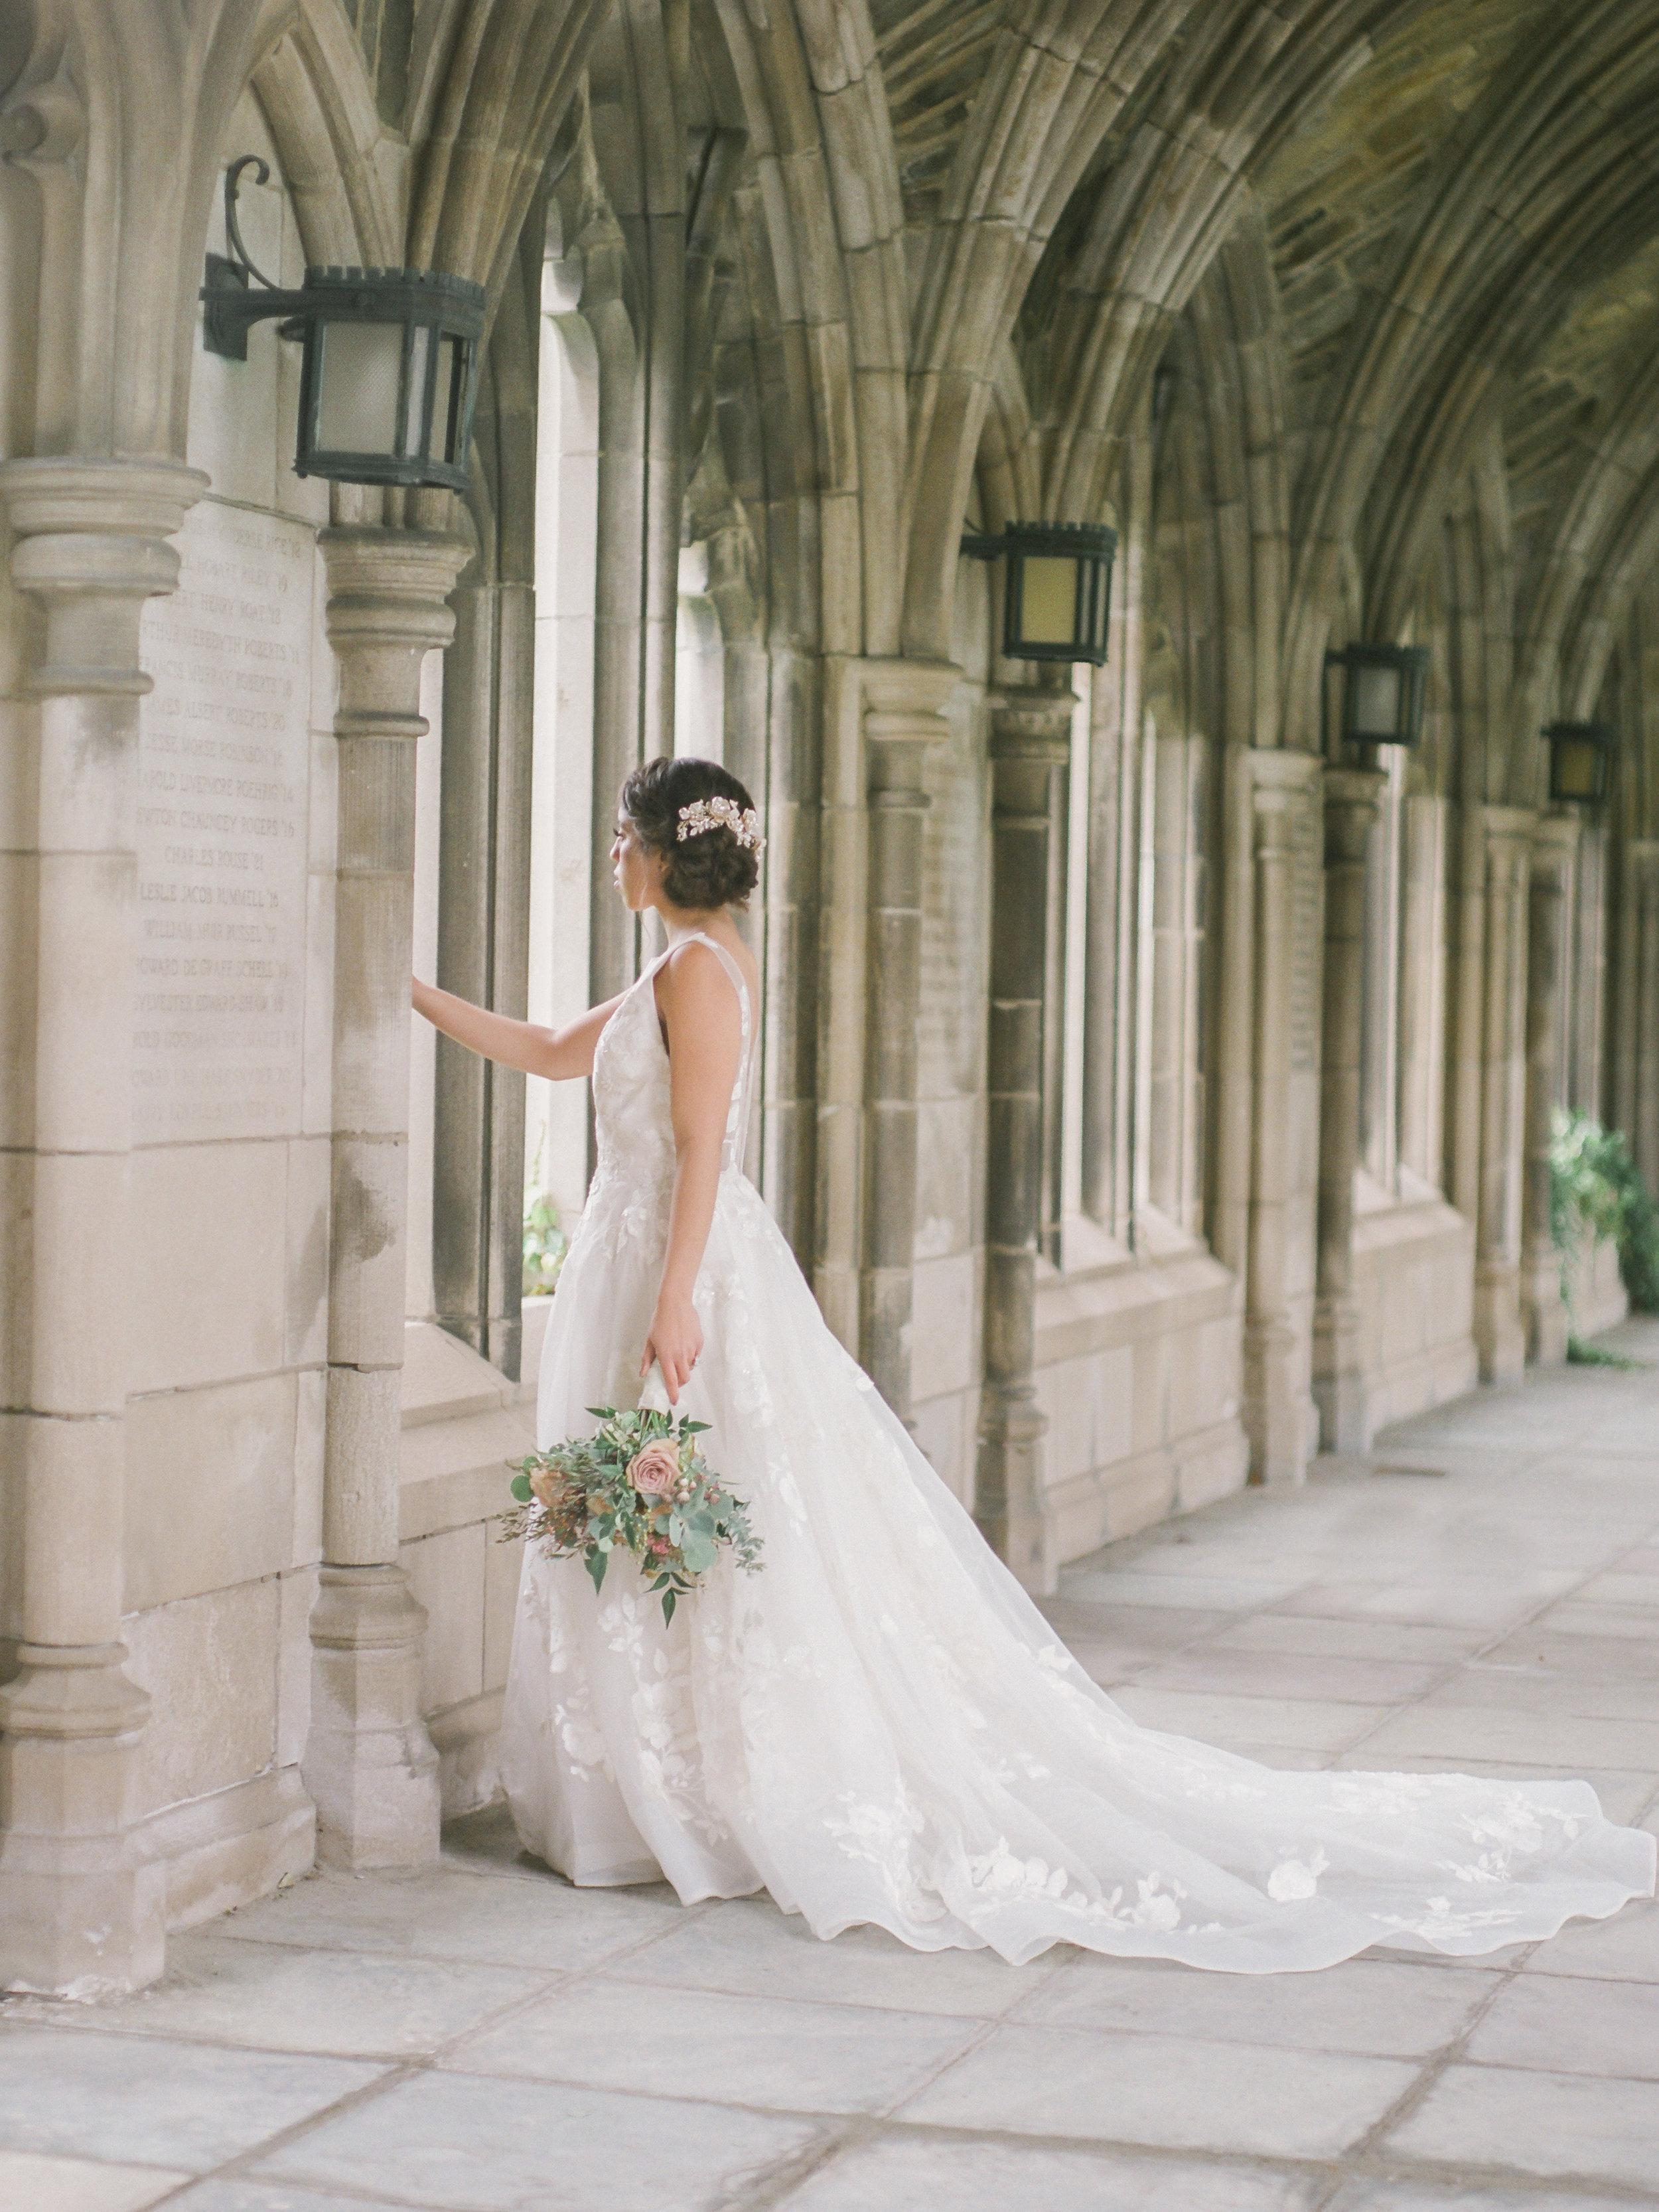 Ithaca New York-Brides Story-Manda Weaver-Wedding-25.jpg